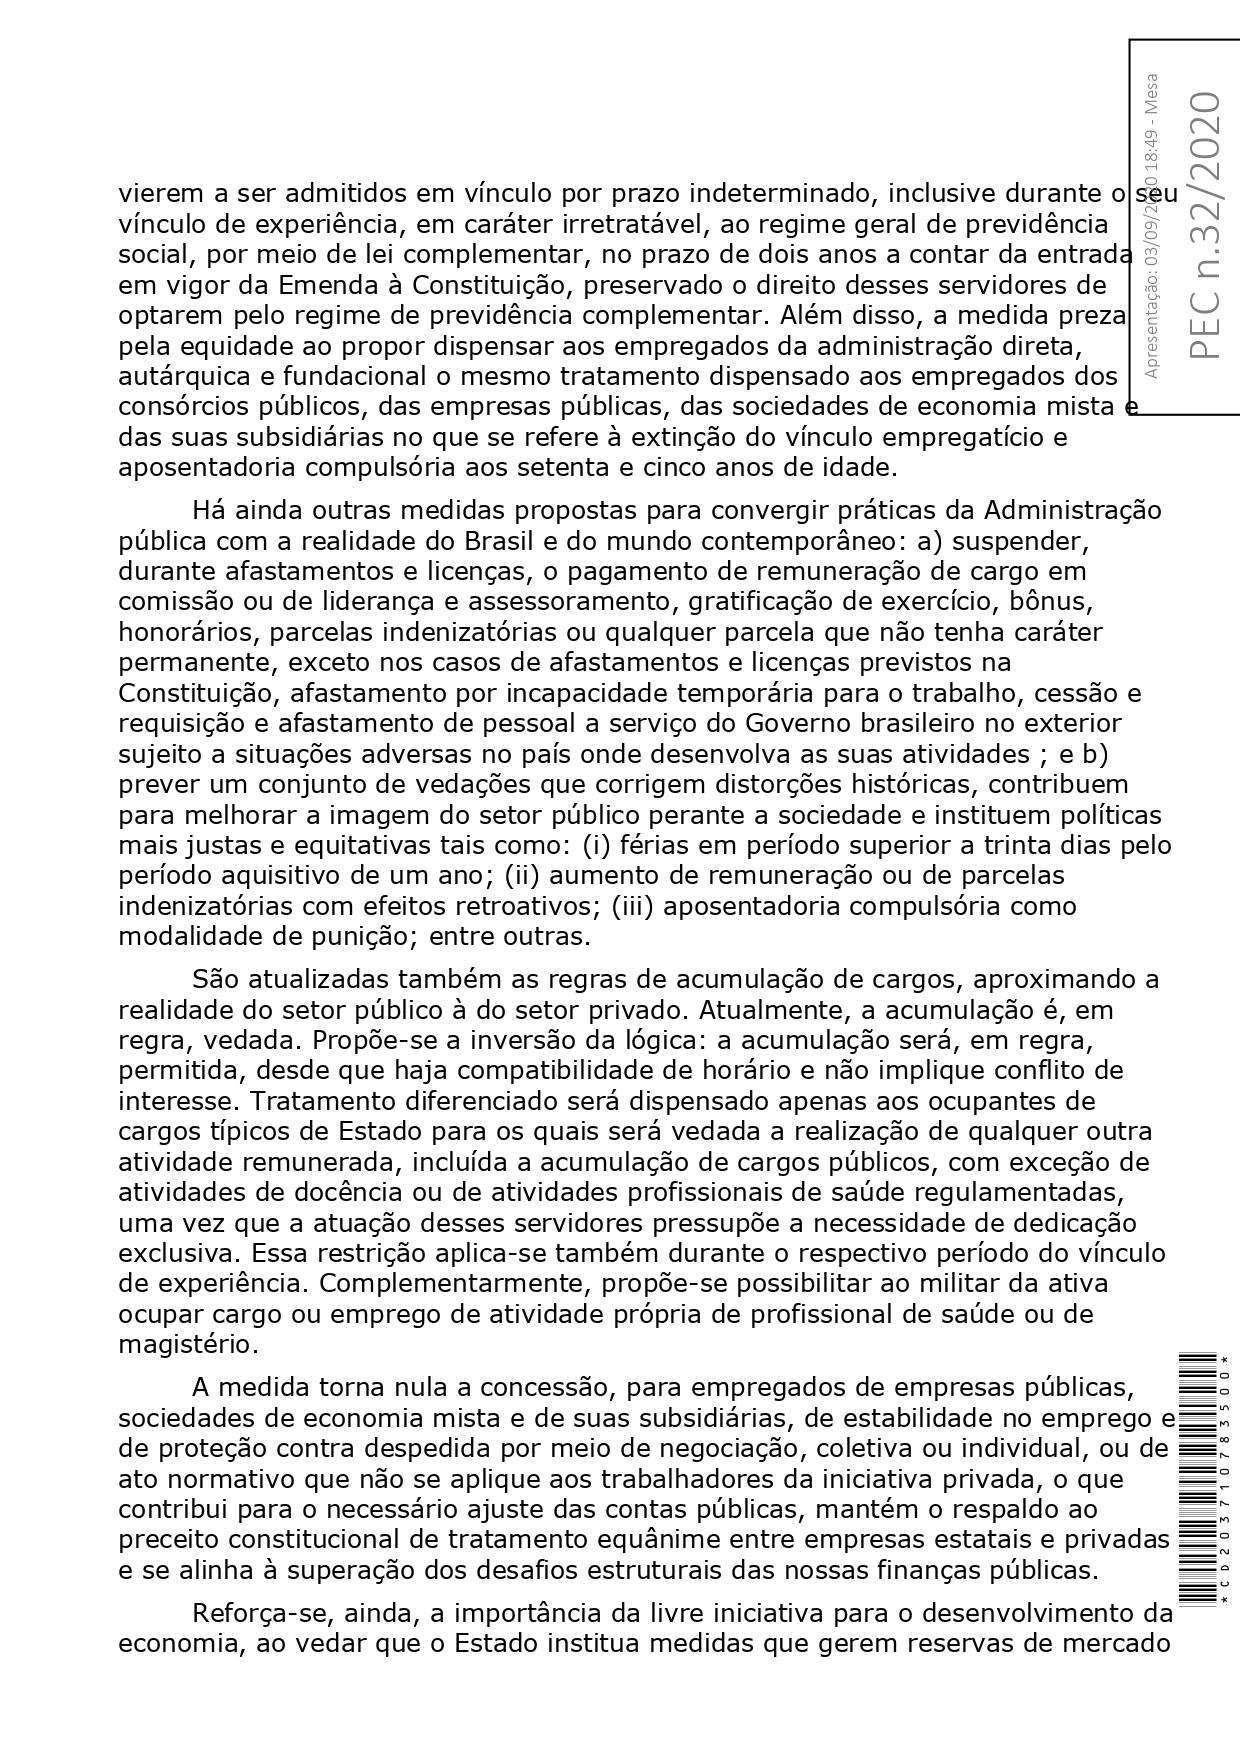 PEC-32-2020_page-0018.jpg